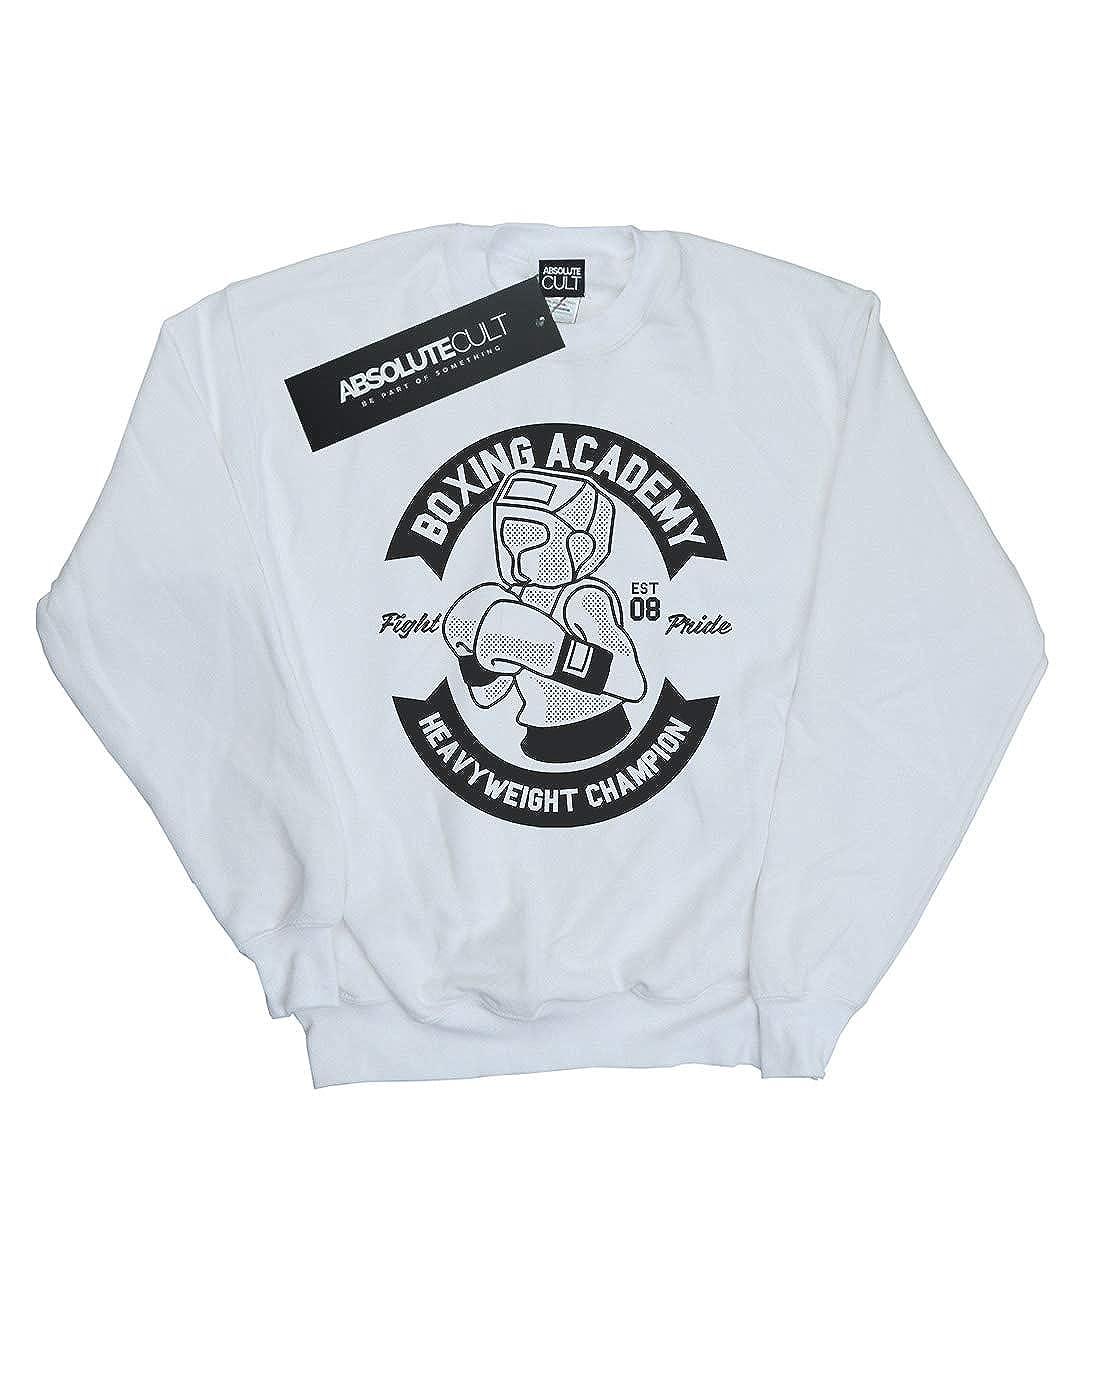 Absolute Cult Drewbacca Womens Boxing Academy Sweatshirt